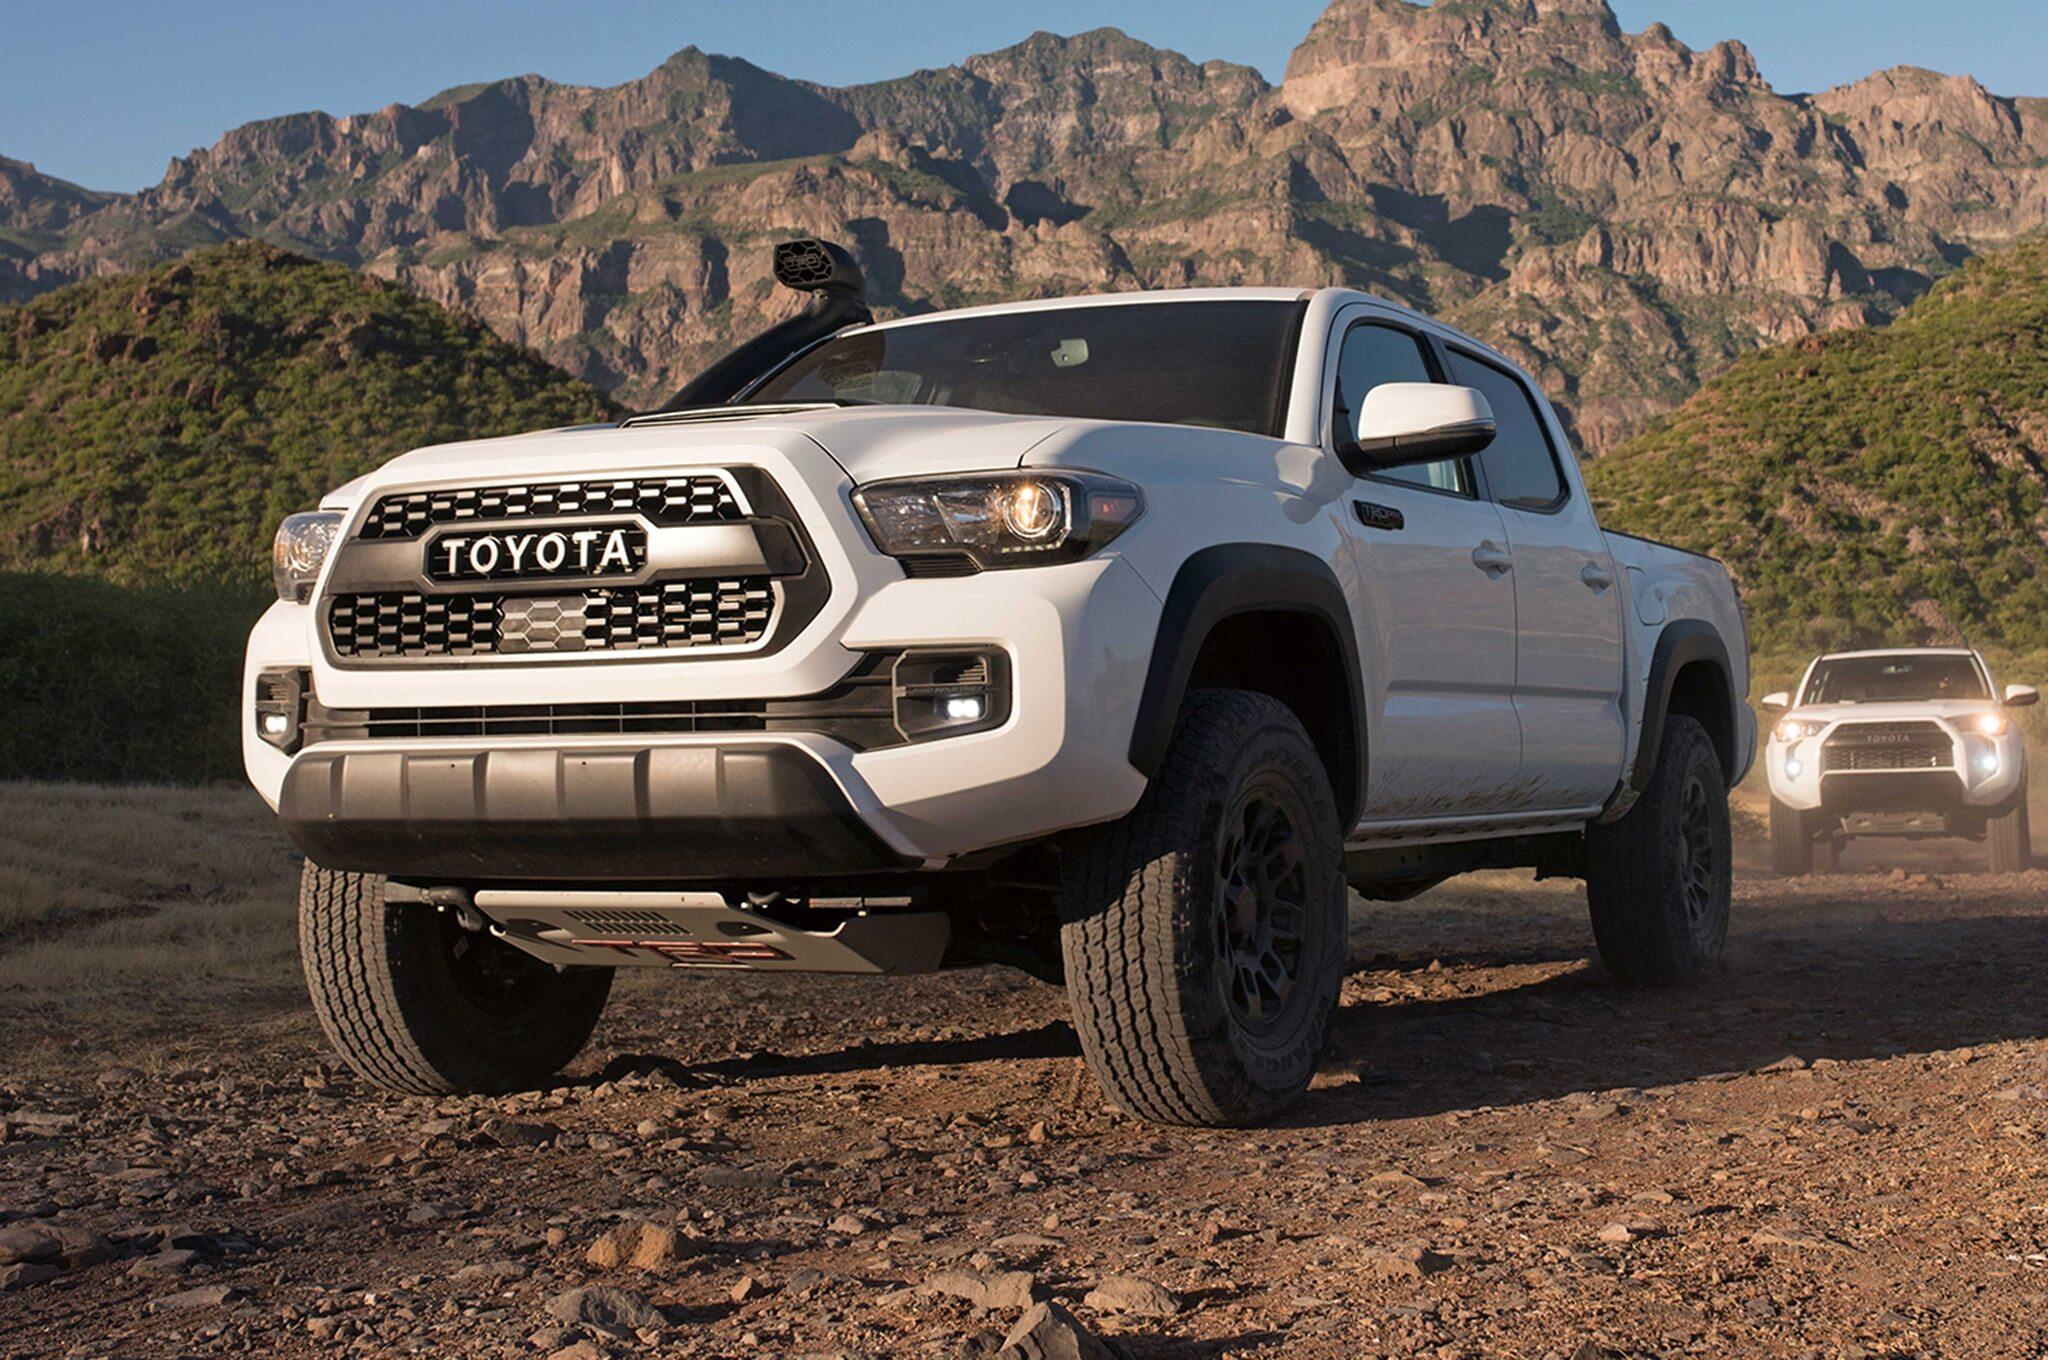 2019-Toyota-Tacoma-TRD-Pro-front-three-quarter-02